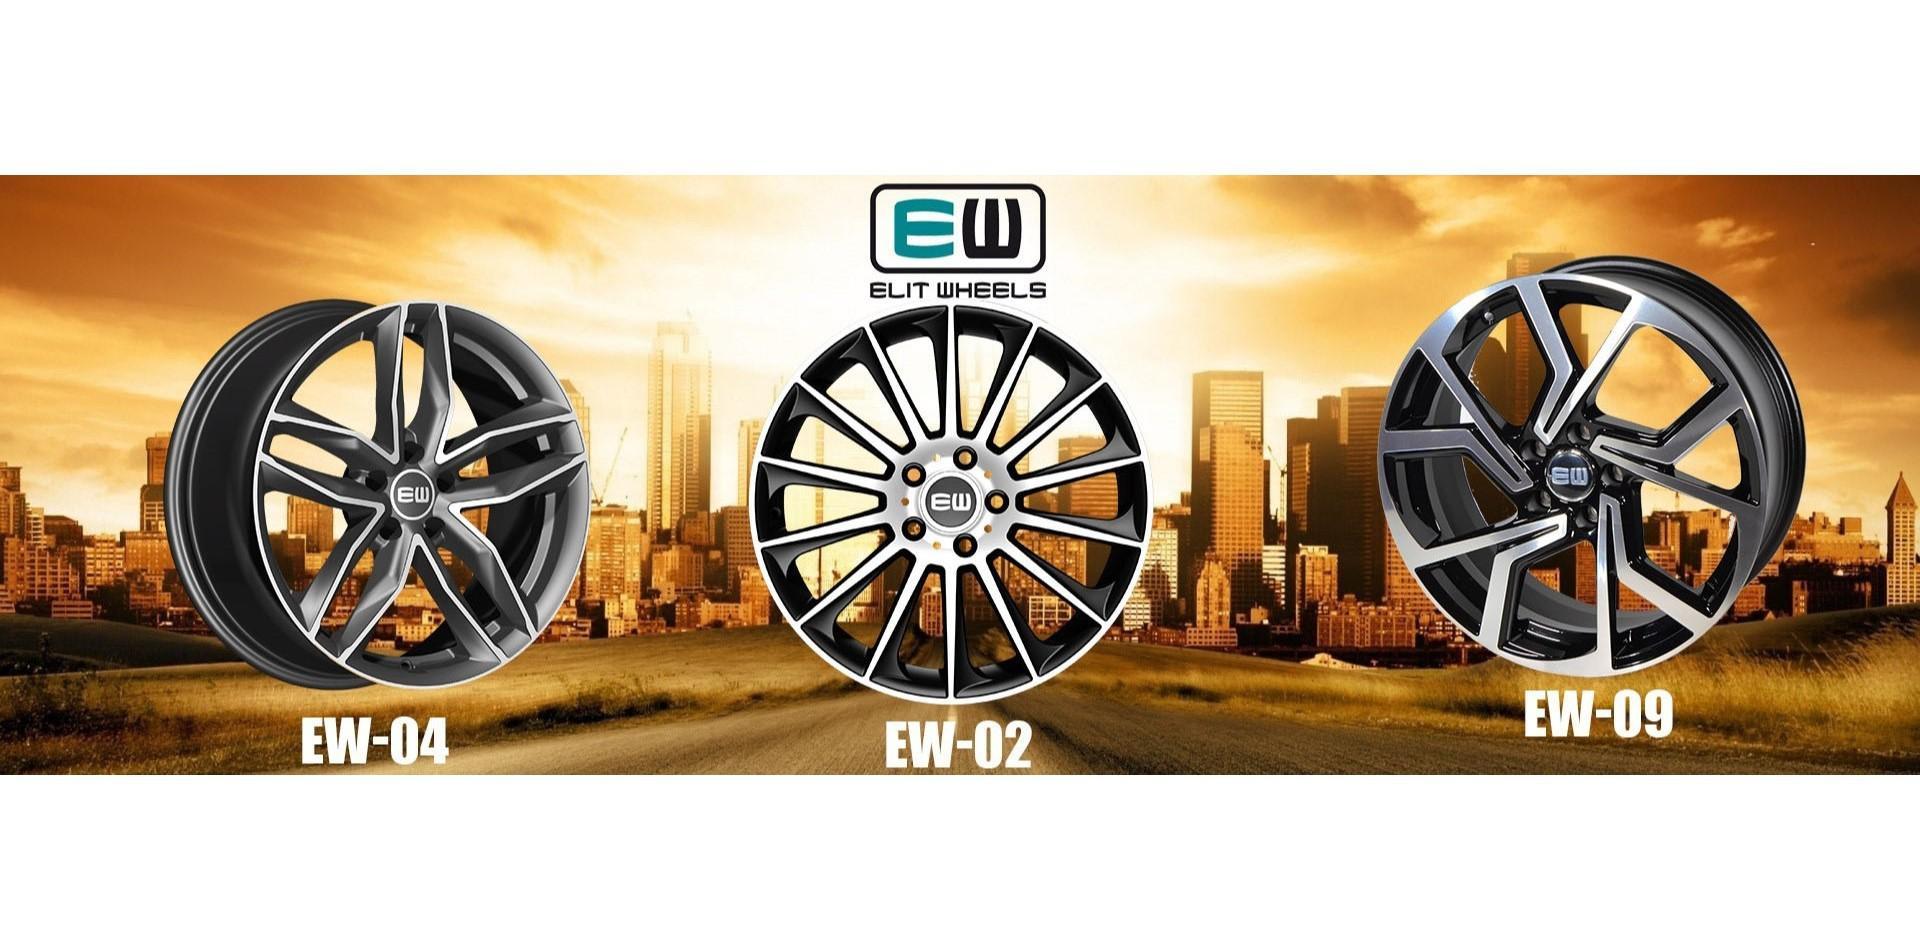 Llantas EW Elite Wheels